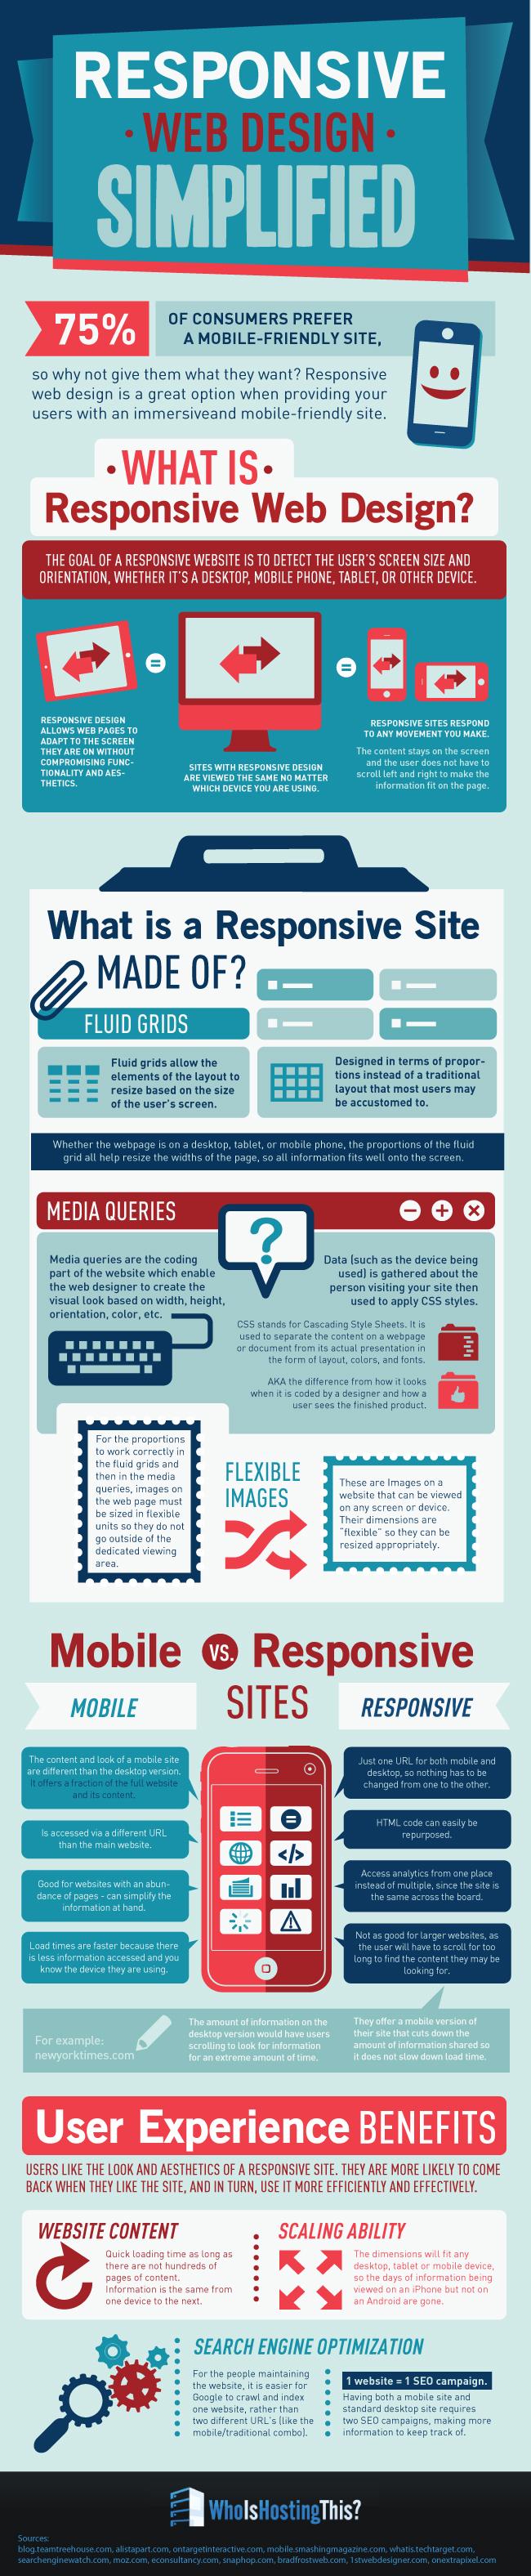 Responsive website infographic